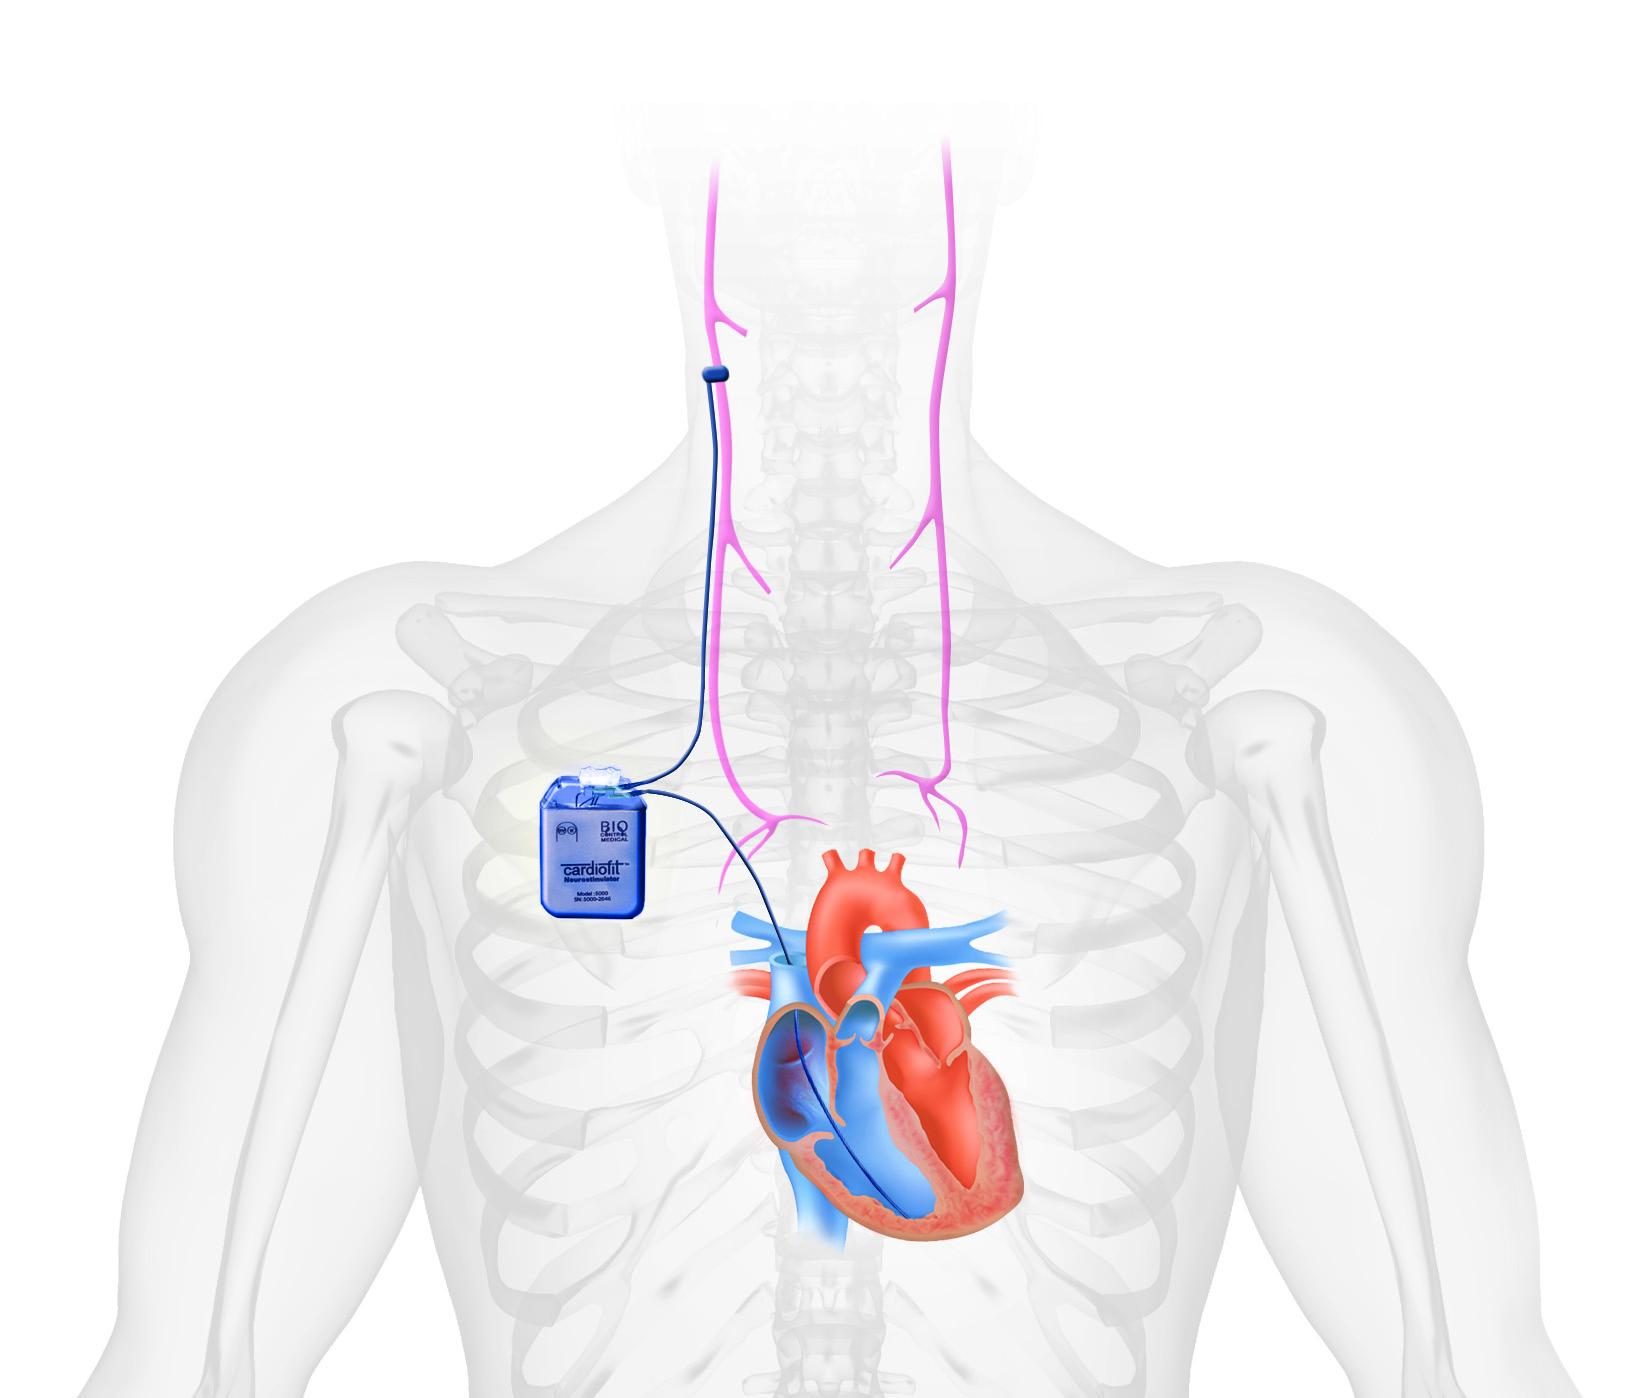 CardioKinetix commences Parachute Ventricular Partitioning ...